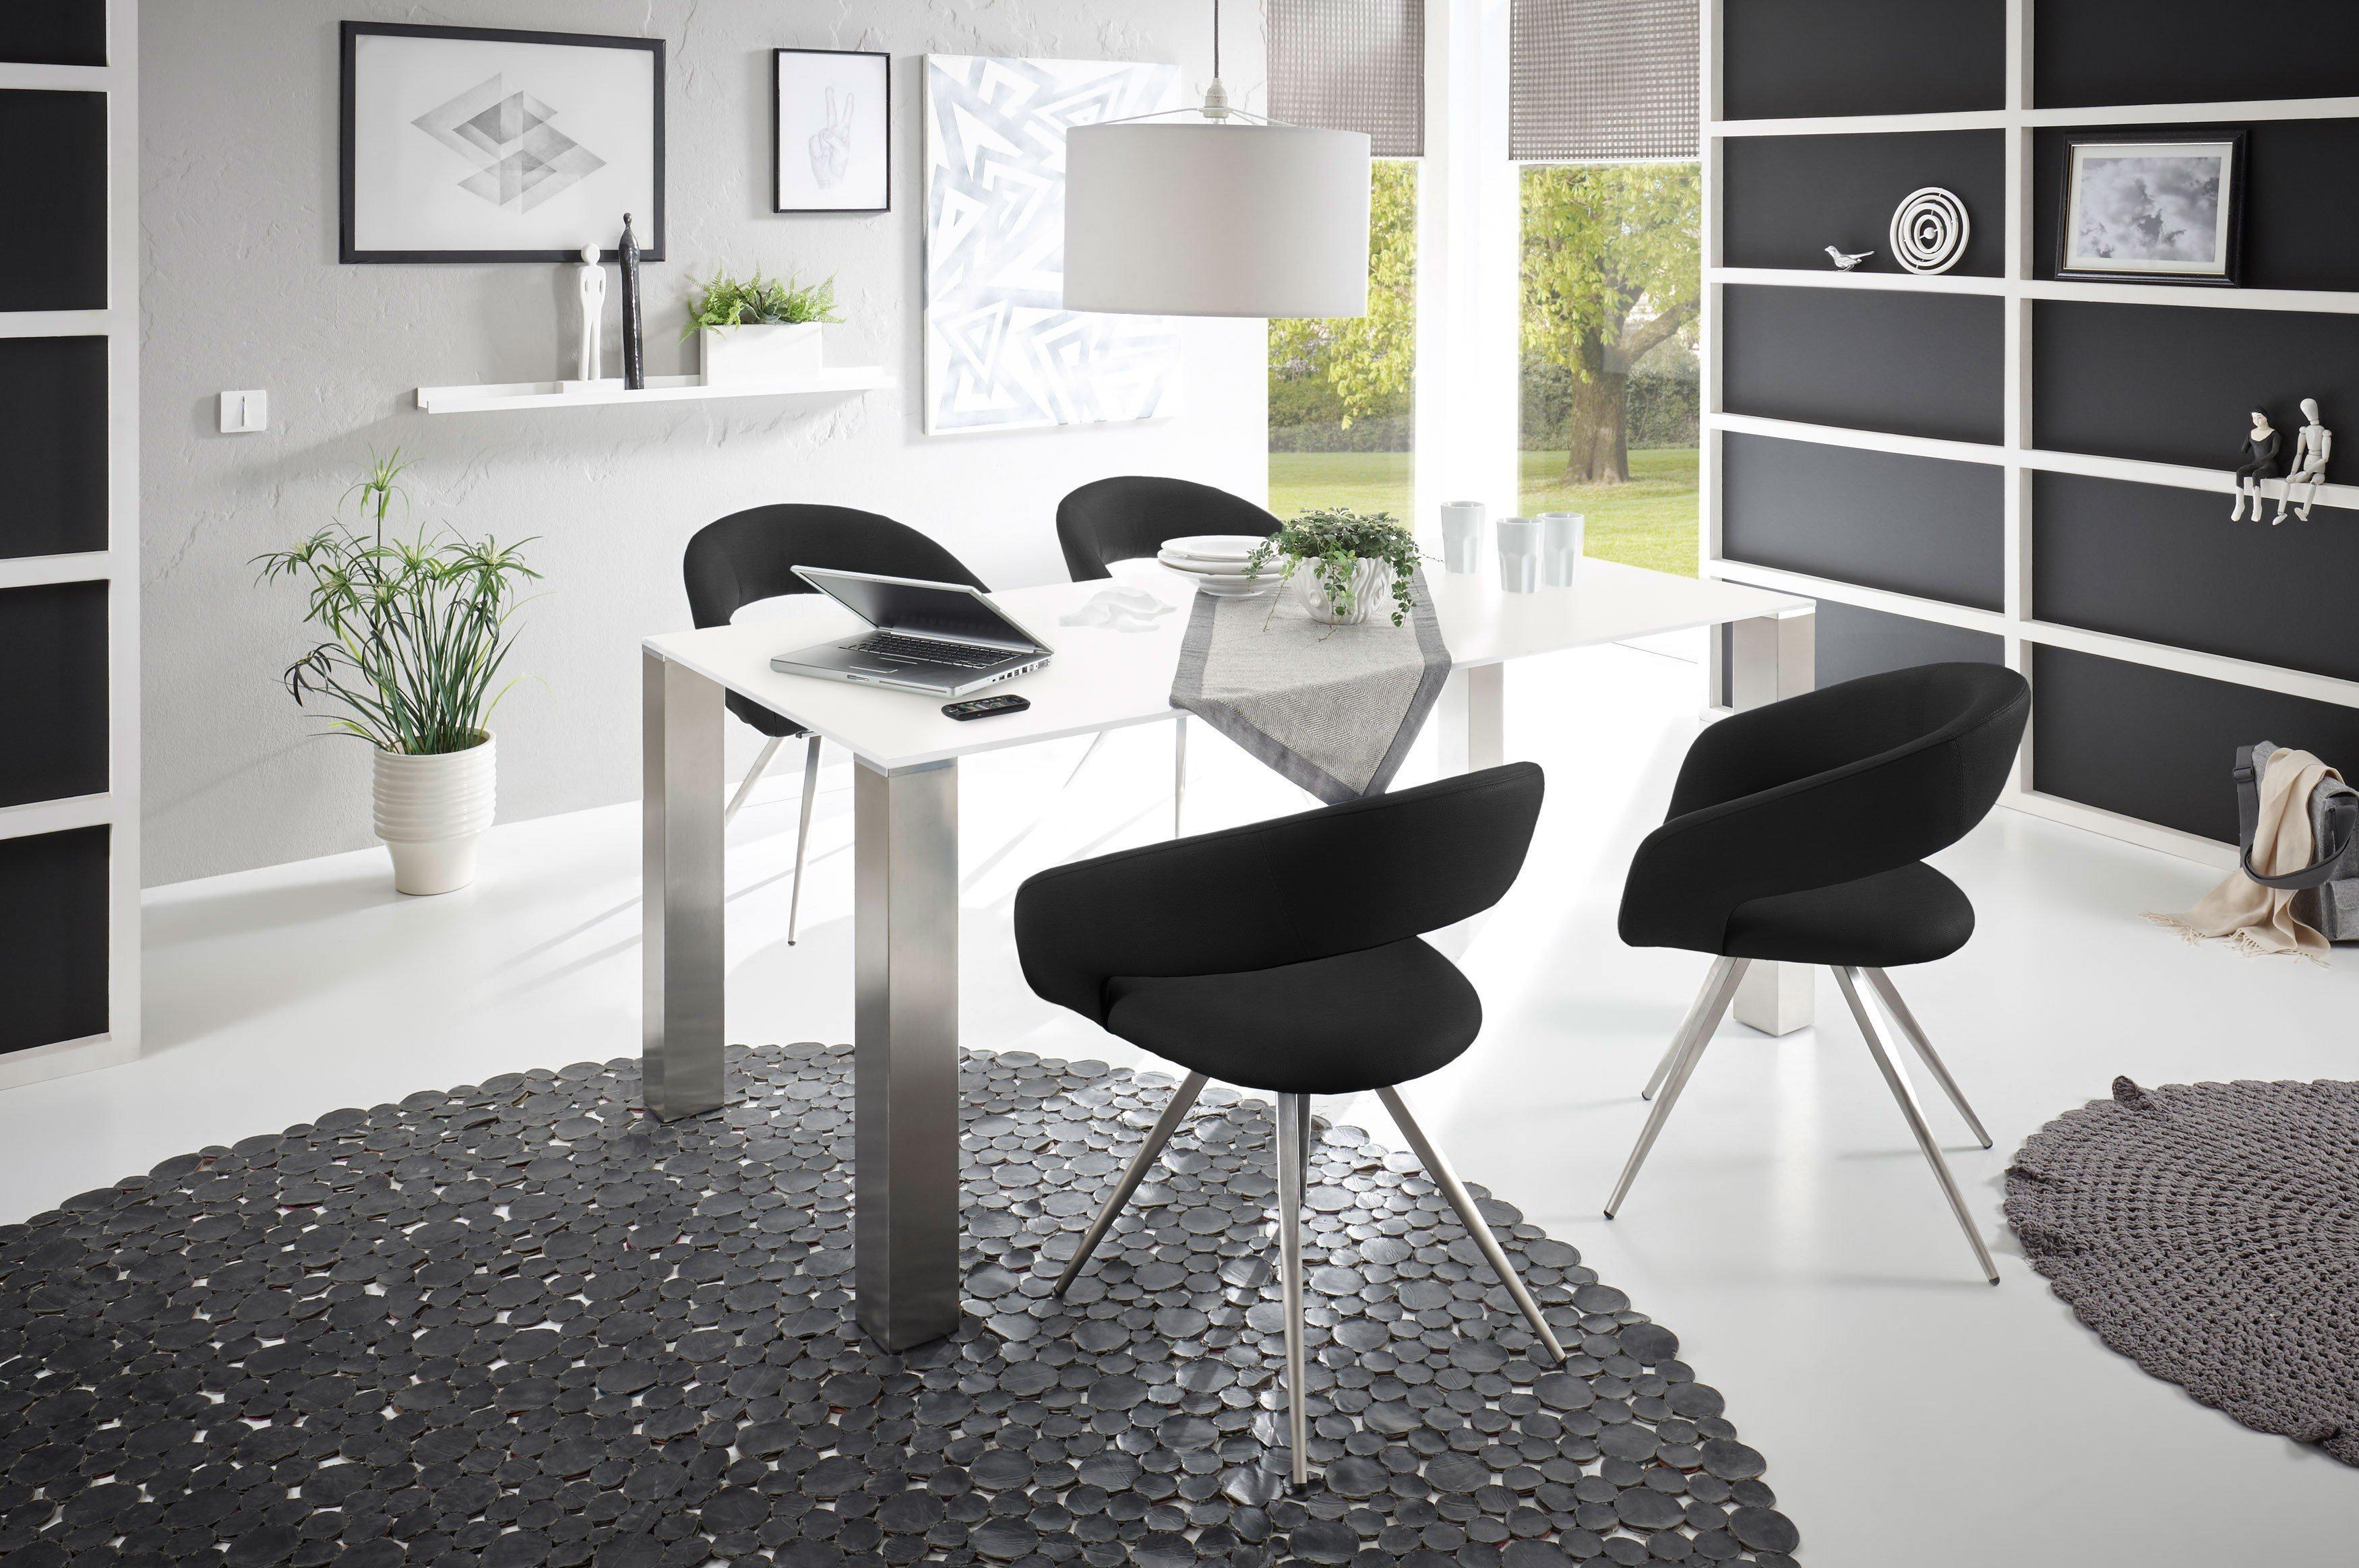 Charmant Luana/ London Von MWA Aktuell   Esszimmer Keramik Weiß/ Coal